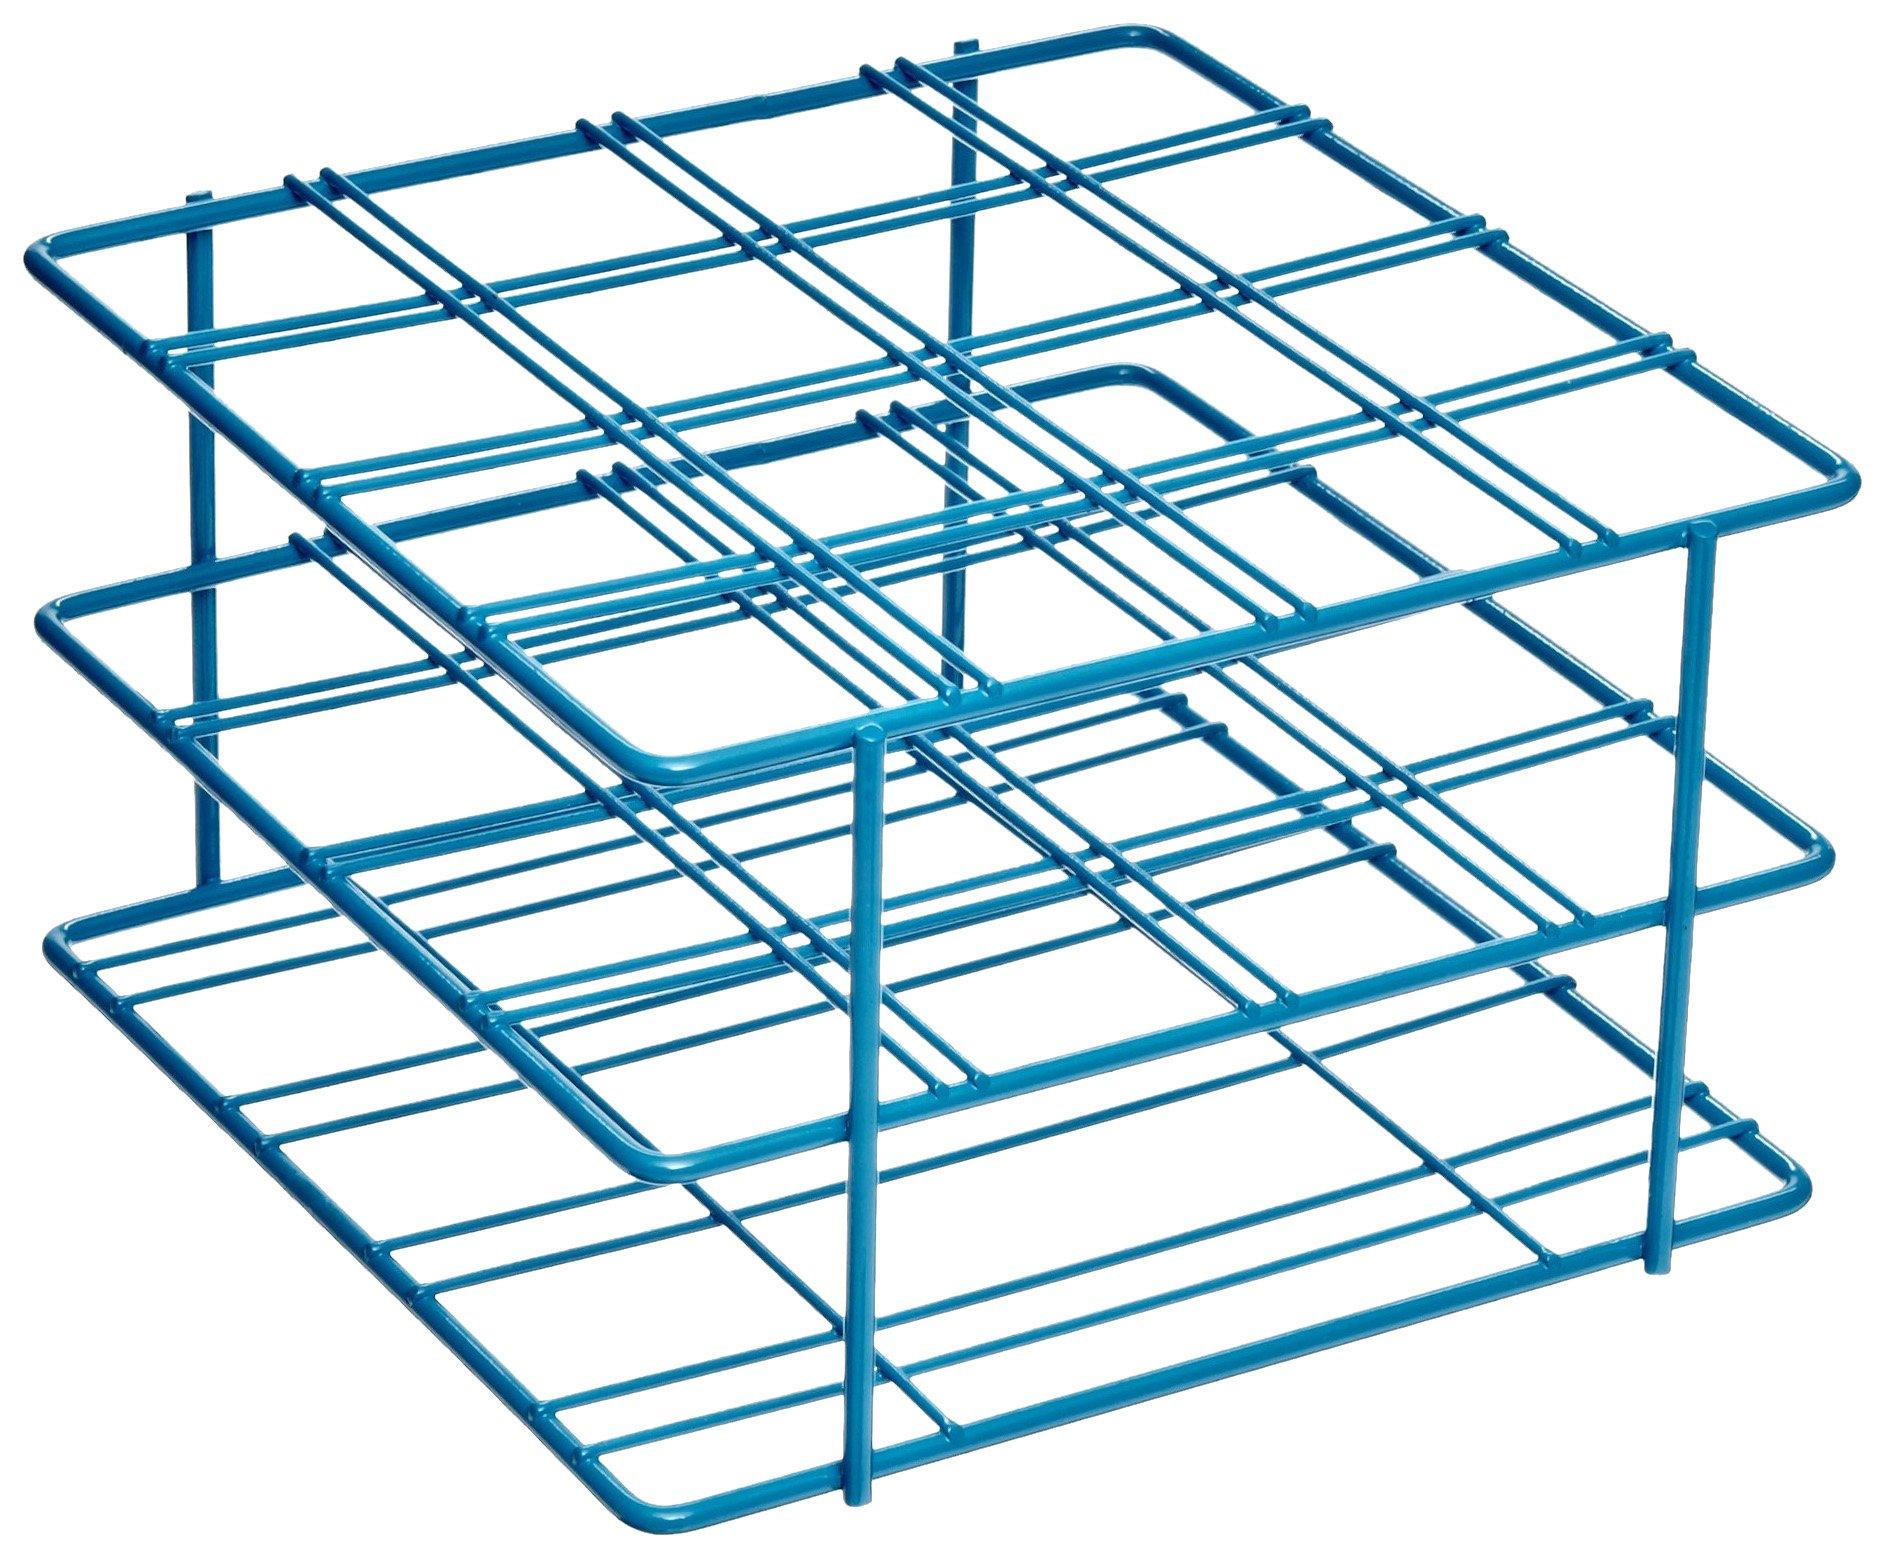 Bel-Art F18794-0001 Poxygrid Centrifuge Tube Rack; 50ml, 16 Places, 6⅛ x 5⅞ x 3⅝ in., Blue